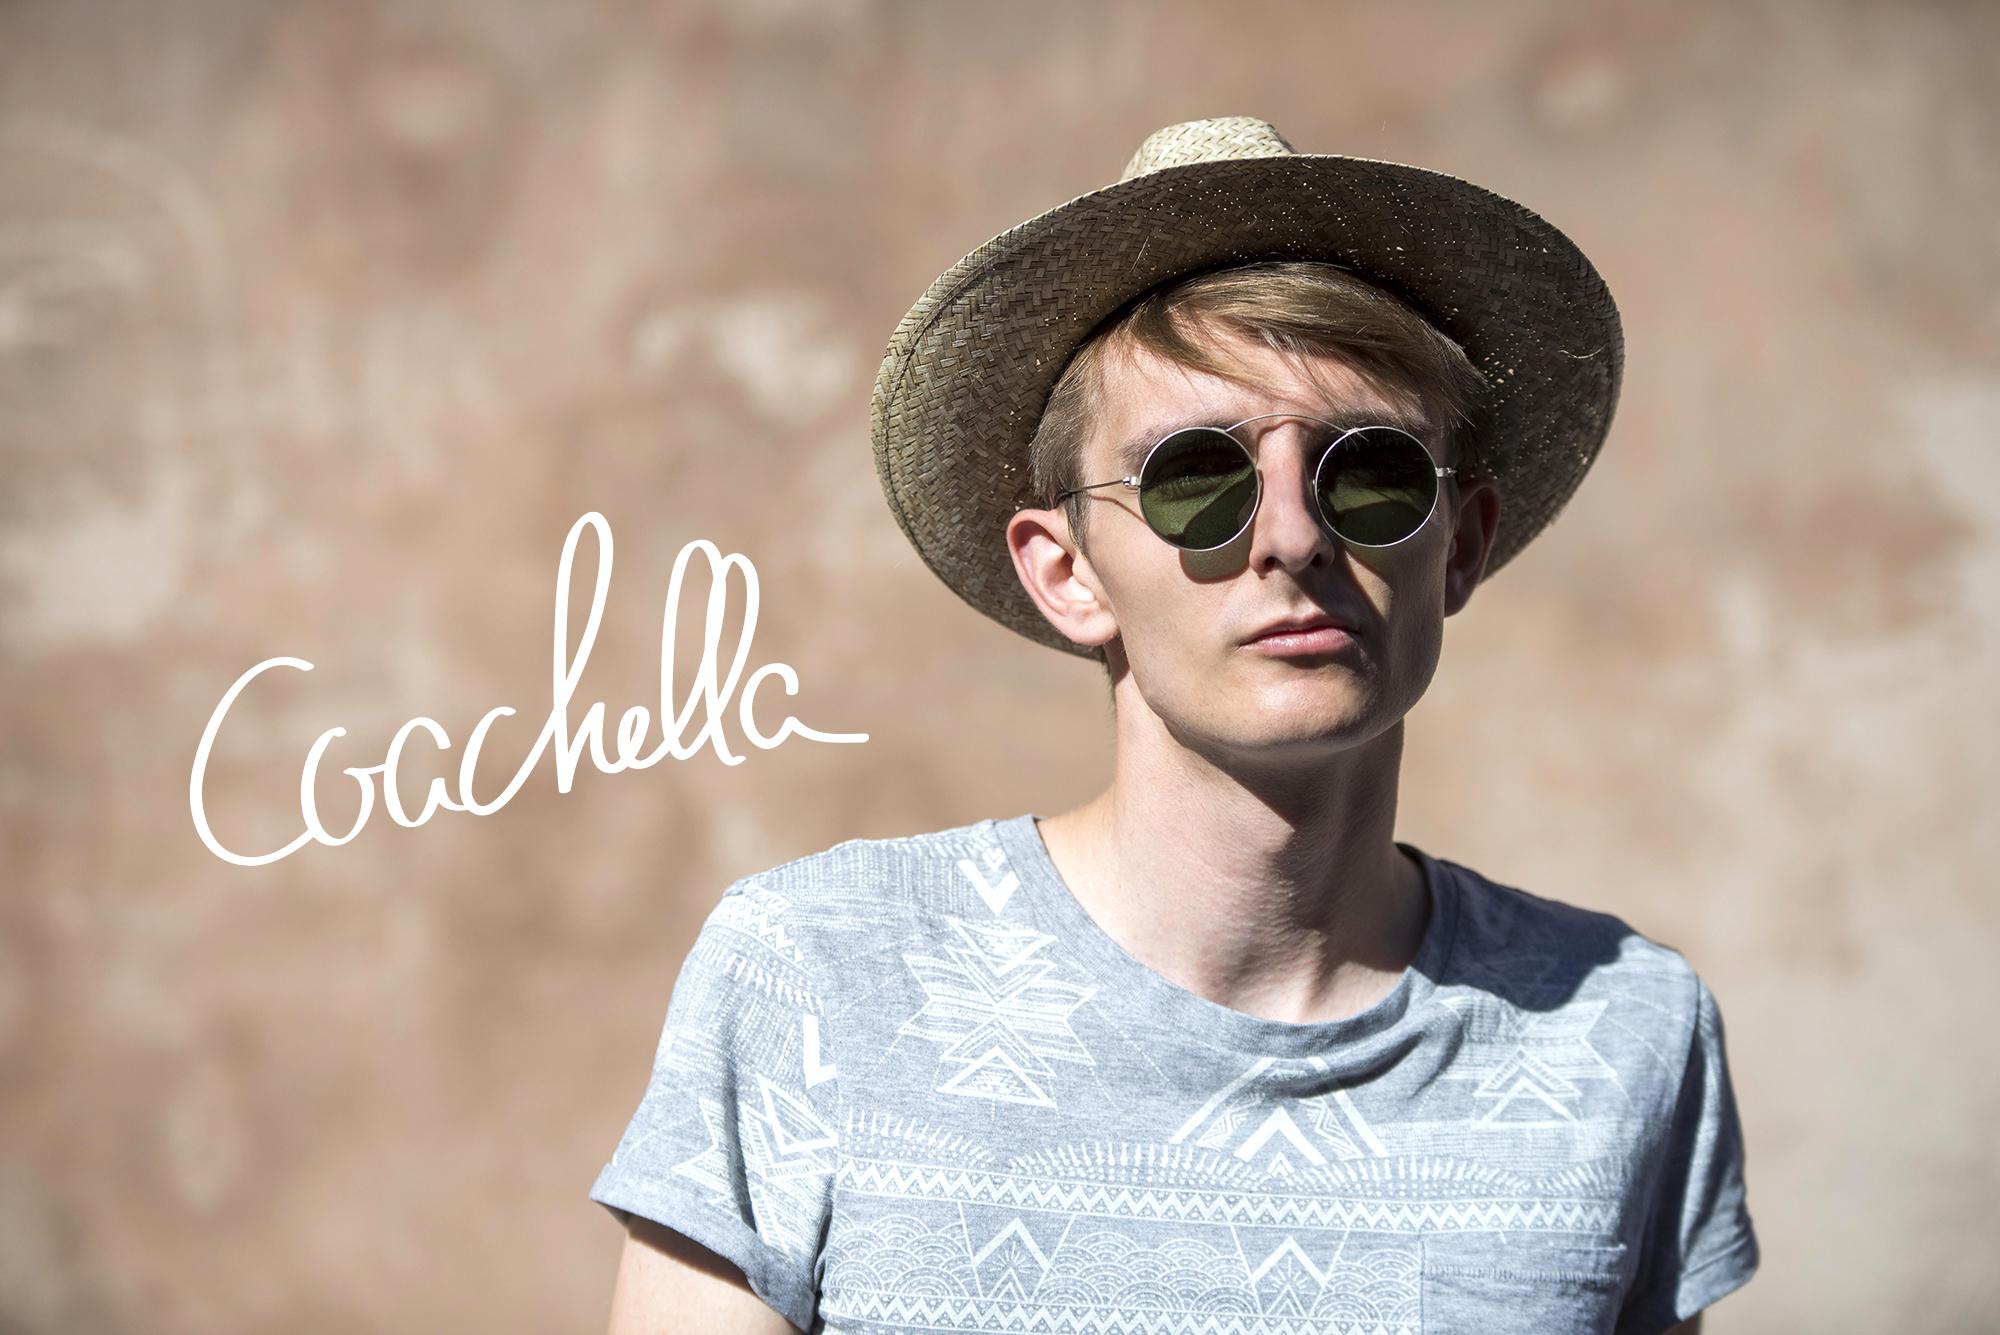 coachella-look-man-lookbook-men-menstyle-festival-style-boho-vintage-hm-blog-mode-homme-strasbourg-paris-french-blogger-2